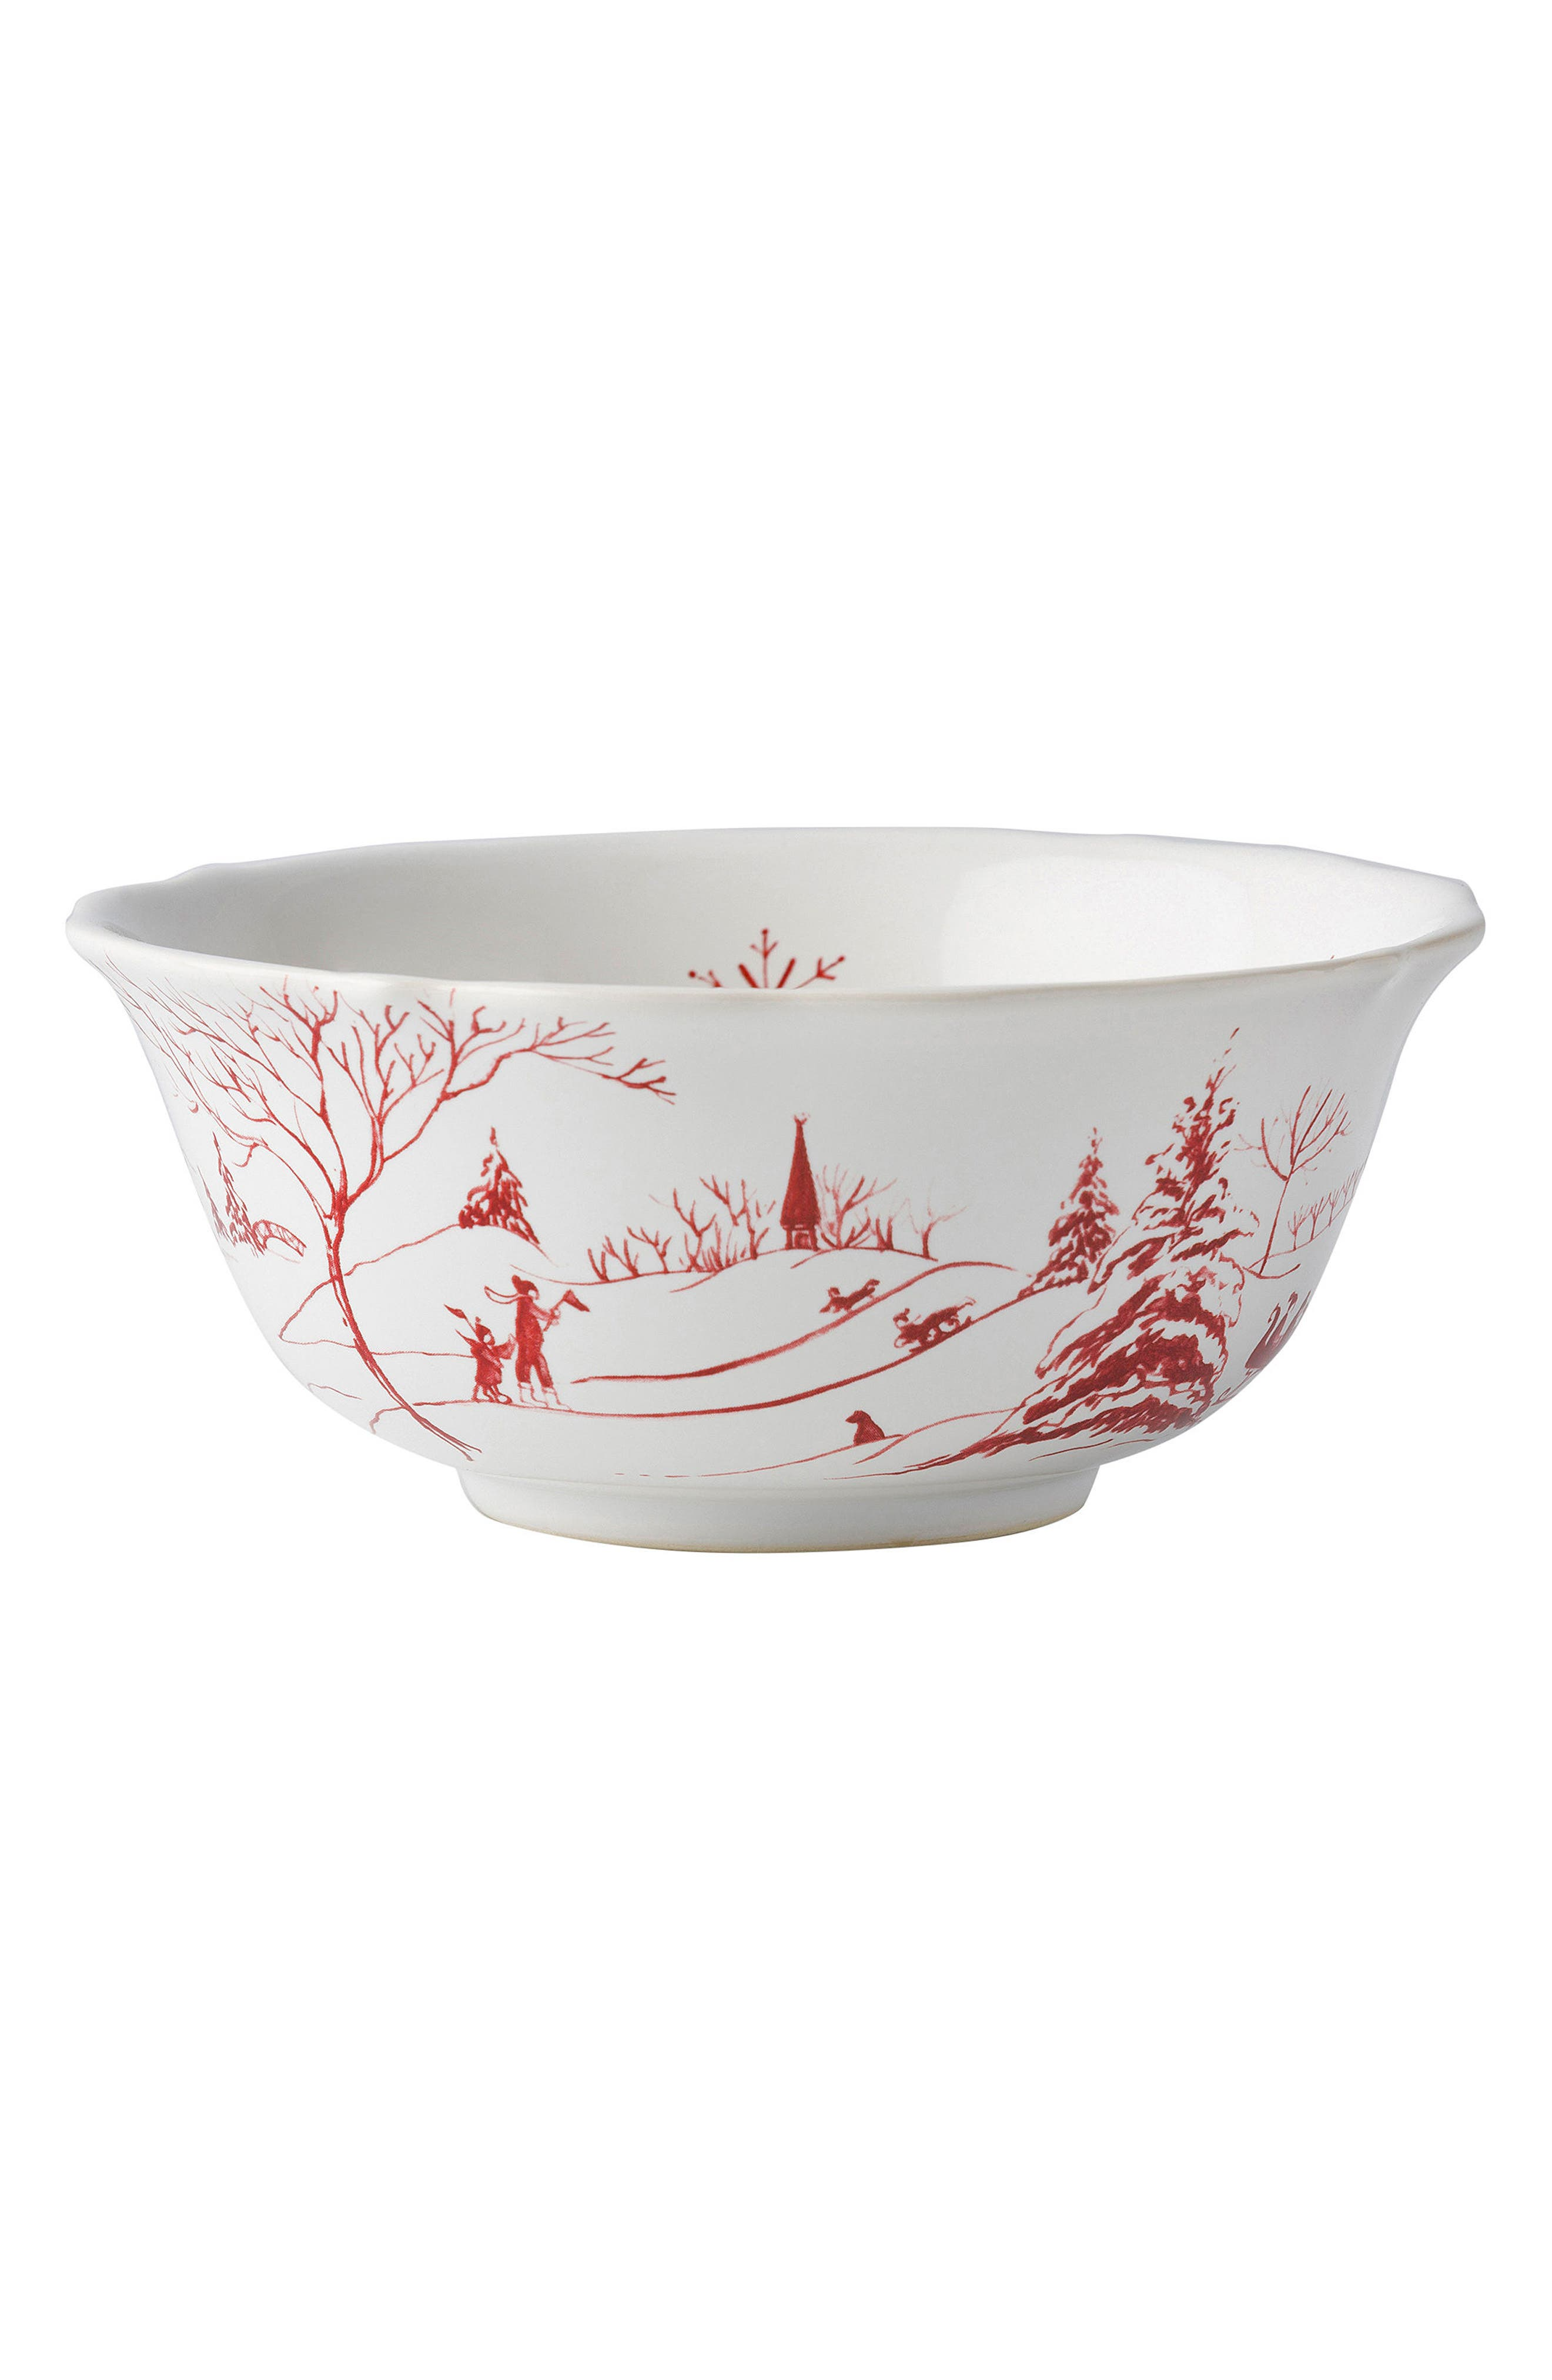 Winter Frolic Ceramic Cereal Bowl,                             Main thumbnail 1, color,                             Ruby